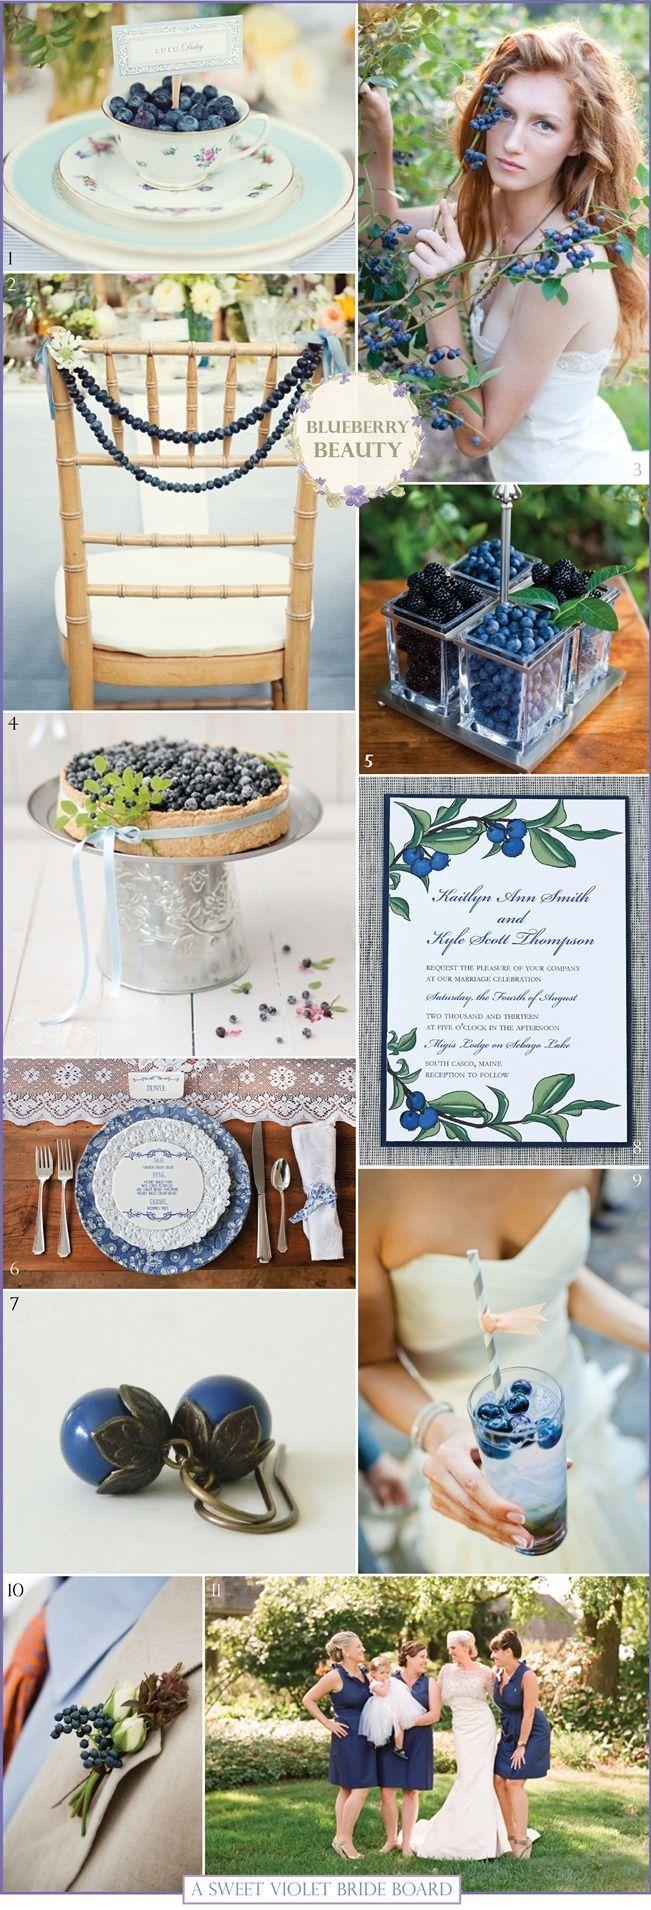 Sweet Violet Bride - Blueberry Beauty  http://sweetvioletbride.com/2013/06/wedding-inspiration-board-8-blueberry-beauty/